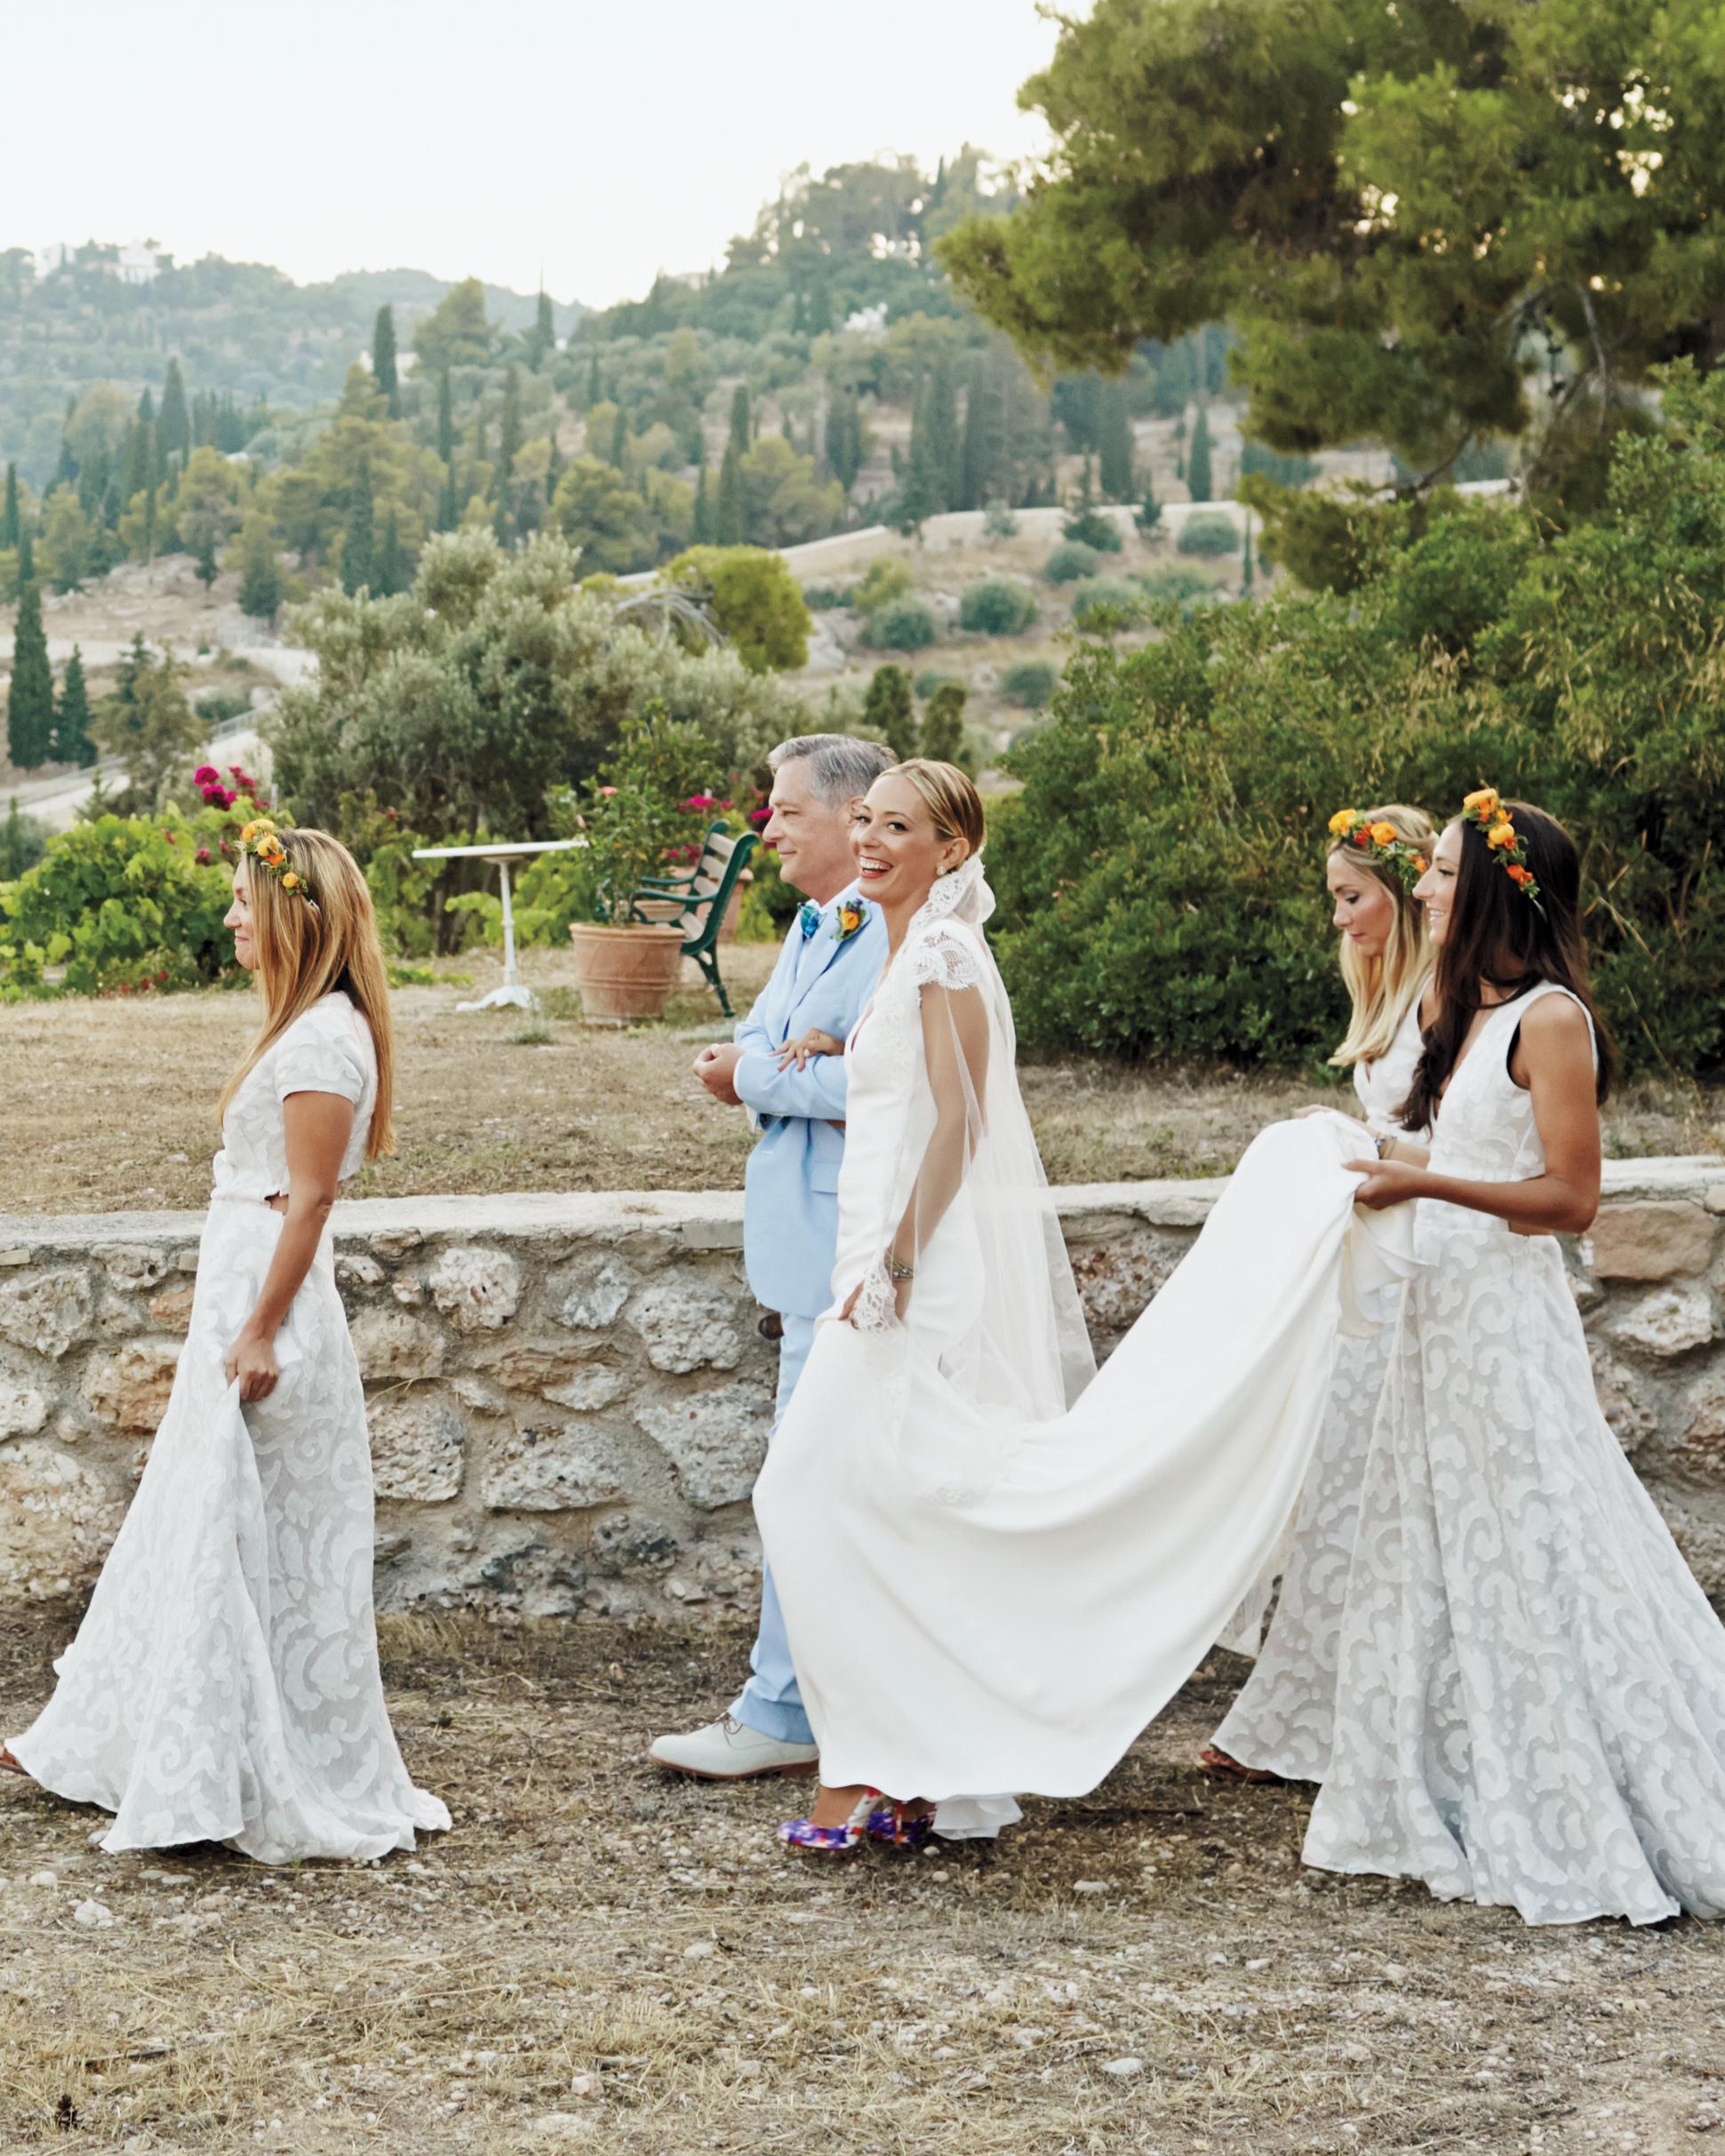 ana-alden-wedding-greece-611a4455-s111821.jpg